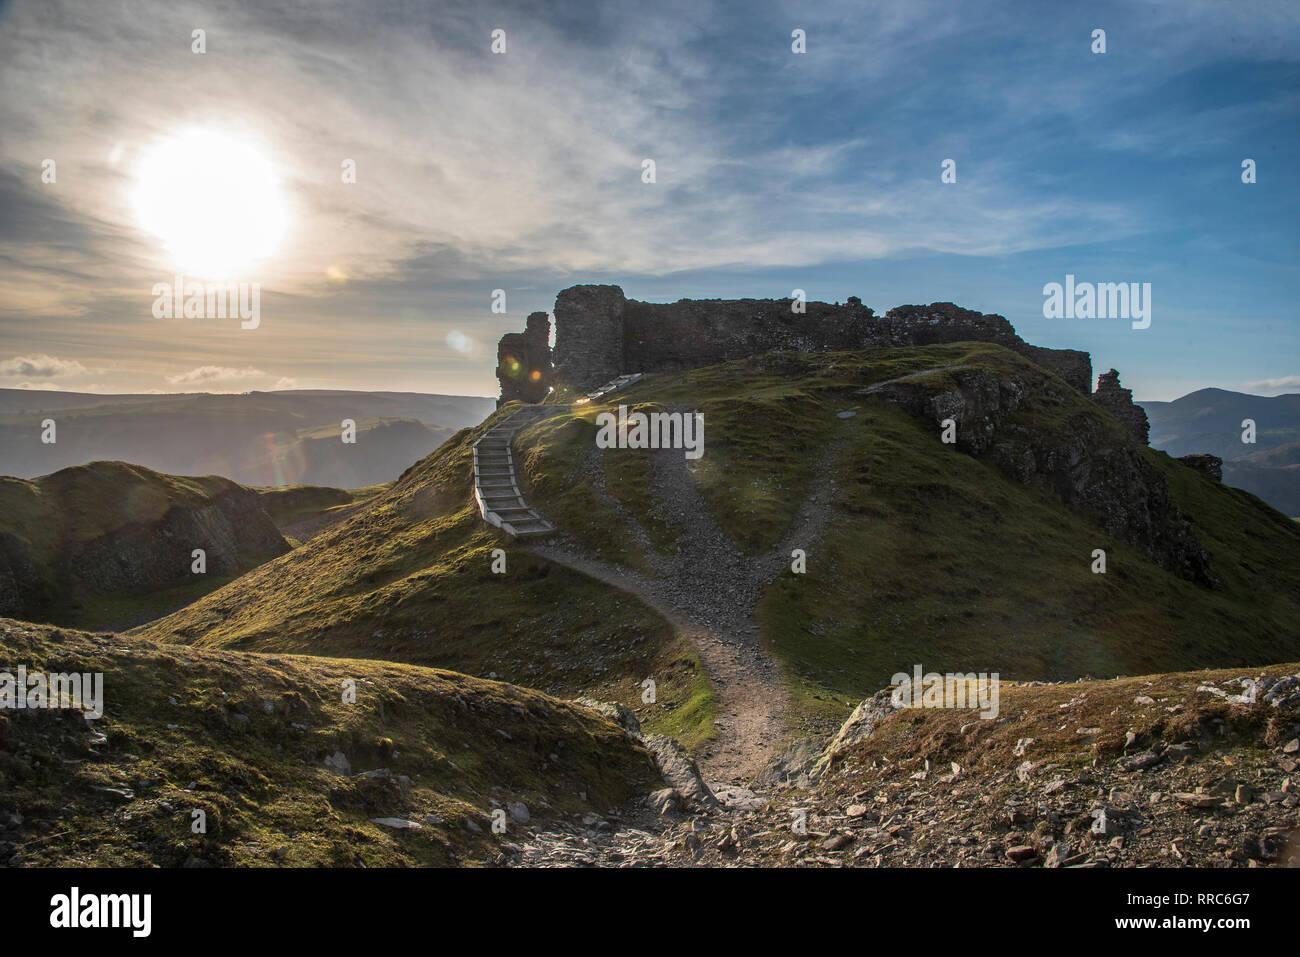 Dinas Bran castle. Llangollen. Castell Dinas Bran. - Stock Image